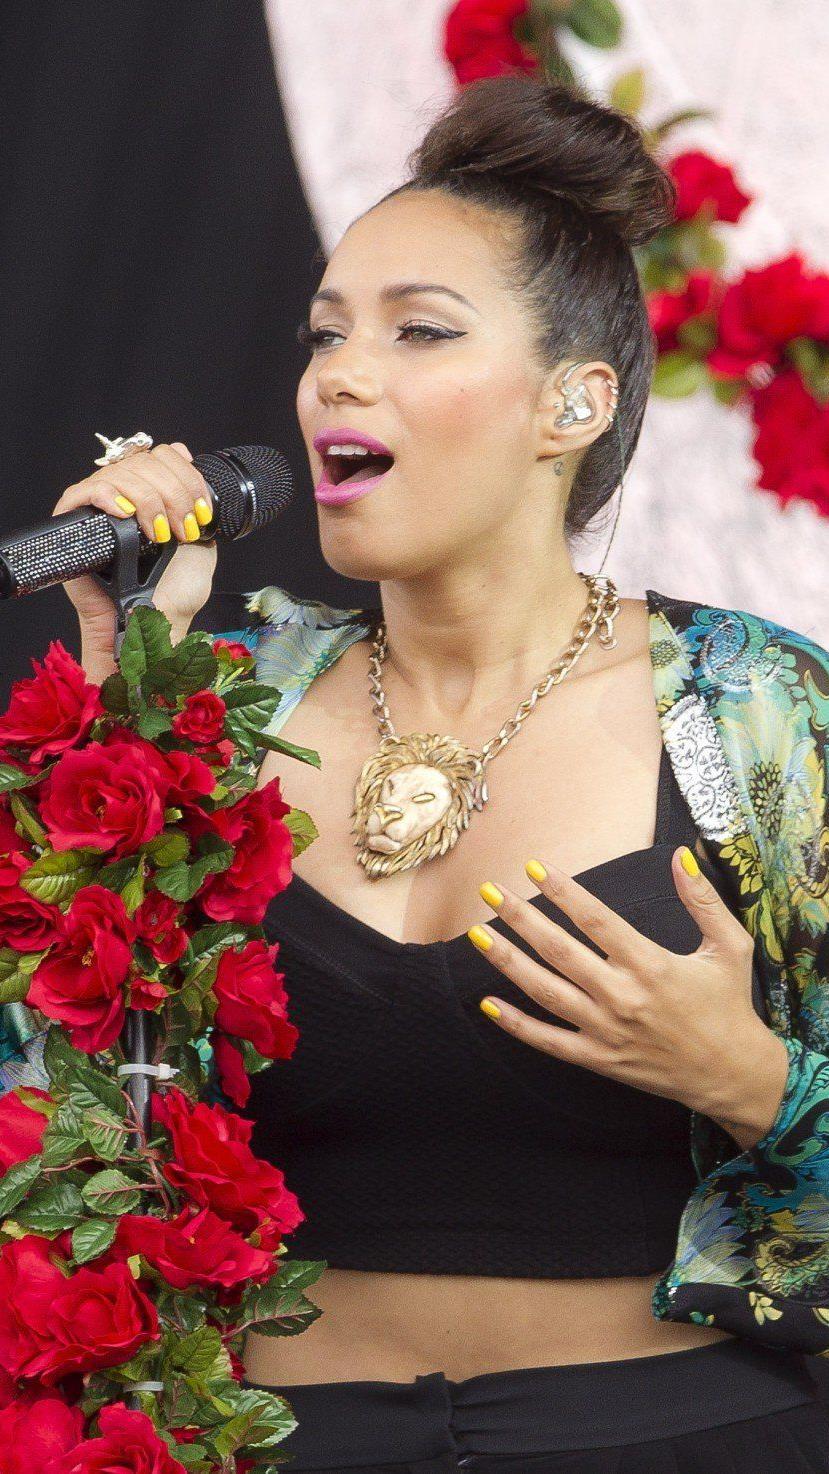 Life Ball - Britischer Kultstar Leona Lewis kommt nach Wien